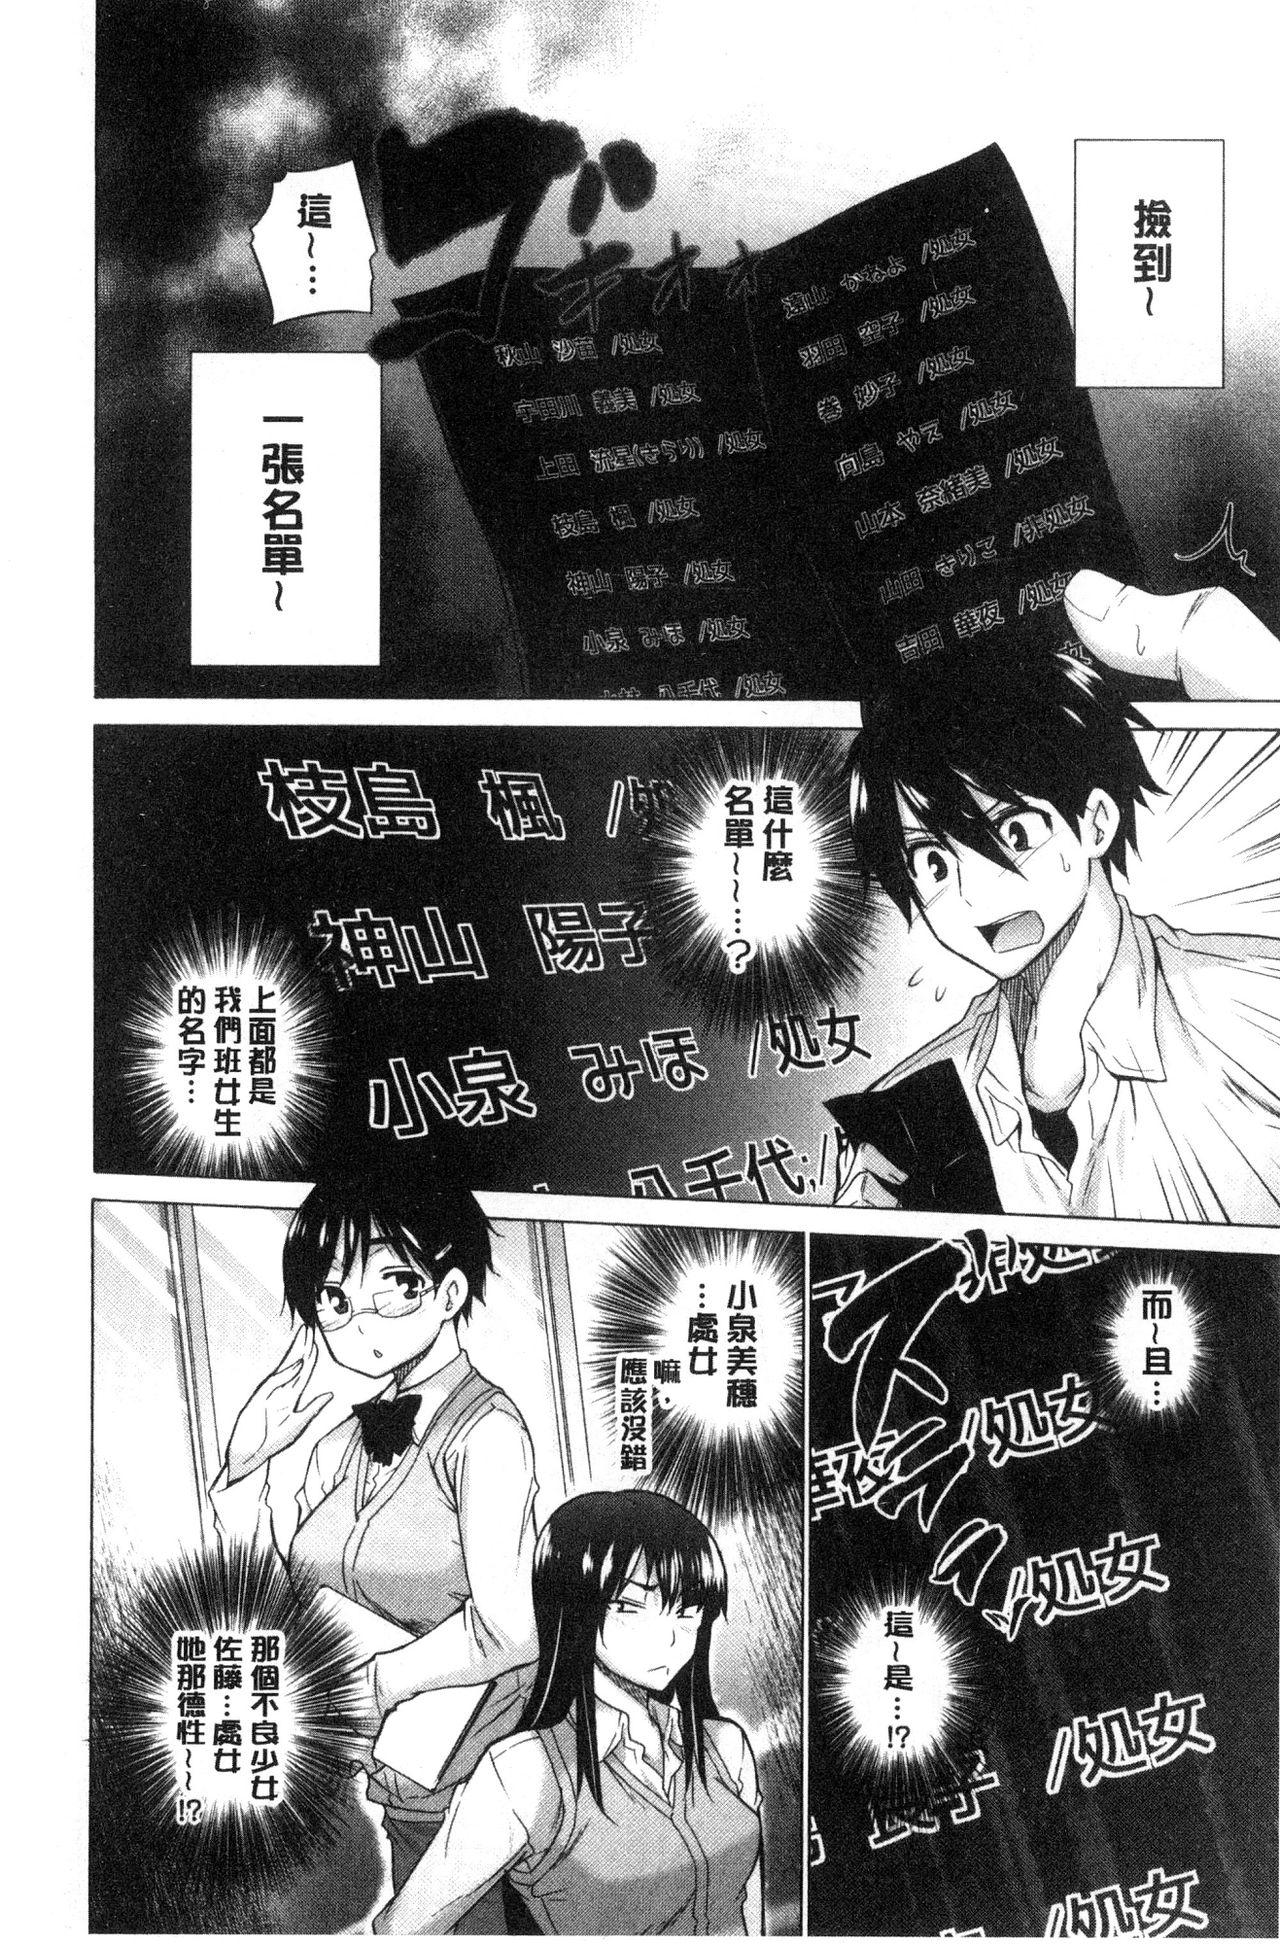 [Miyano Kintarou] Hishoujo List - The Non-Virgin List  | 非處女的名單 [Chinese] 13